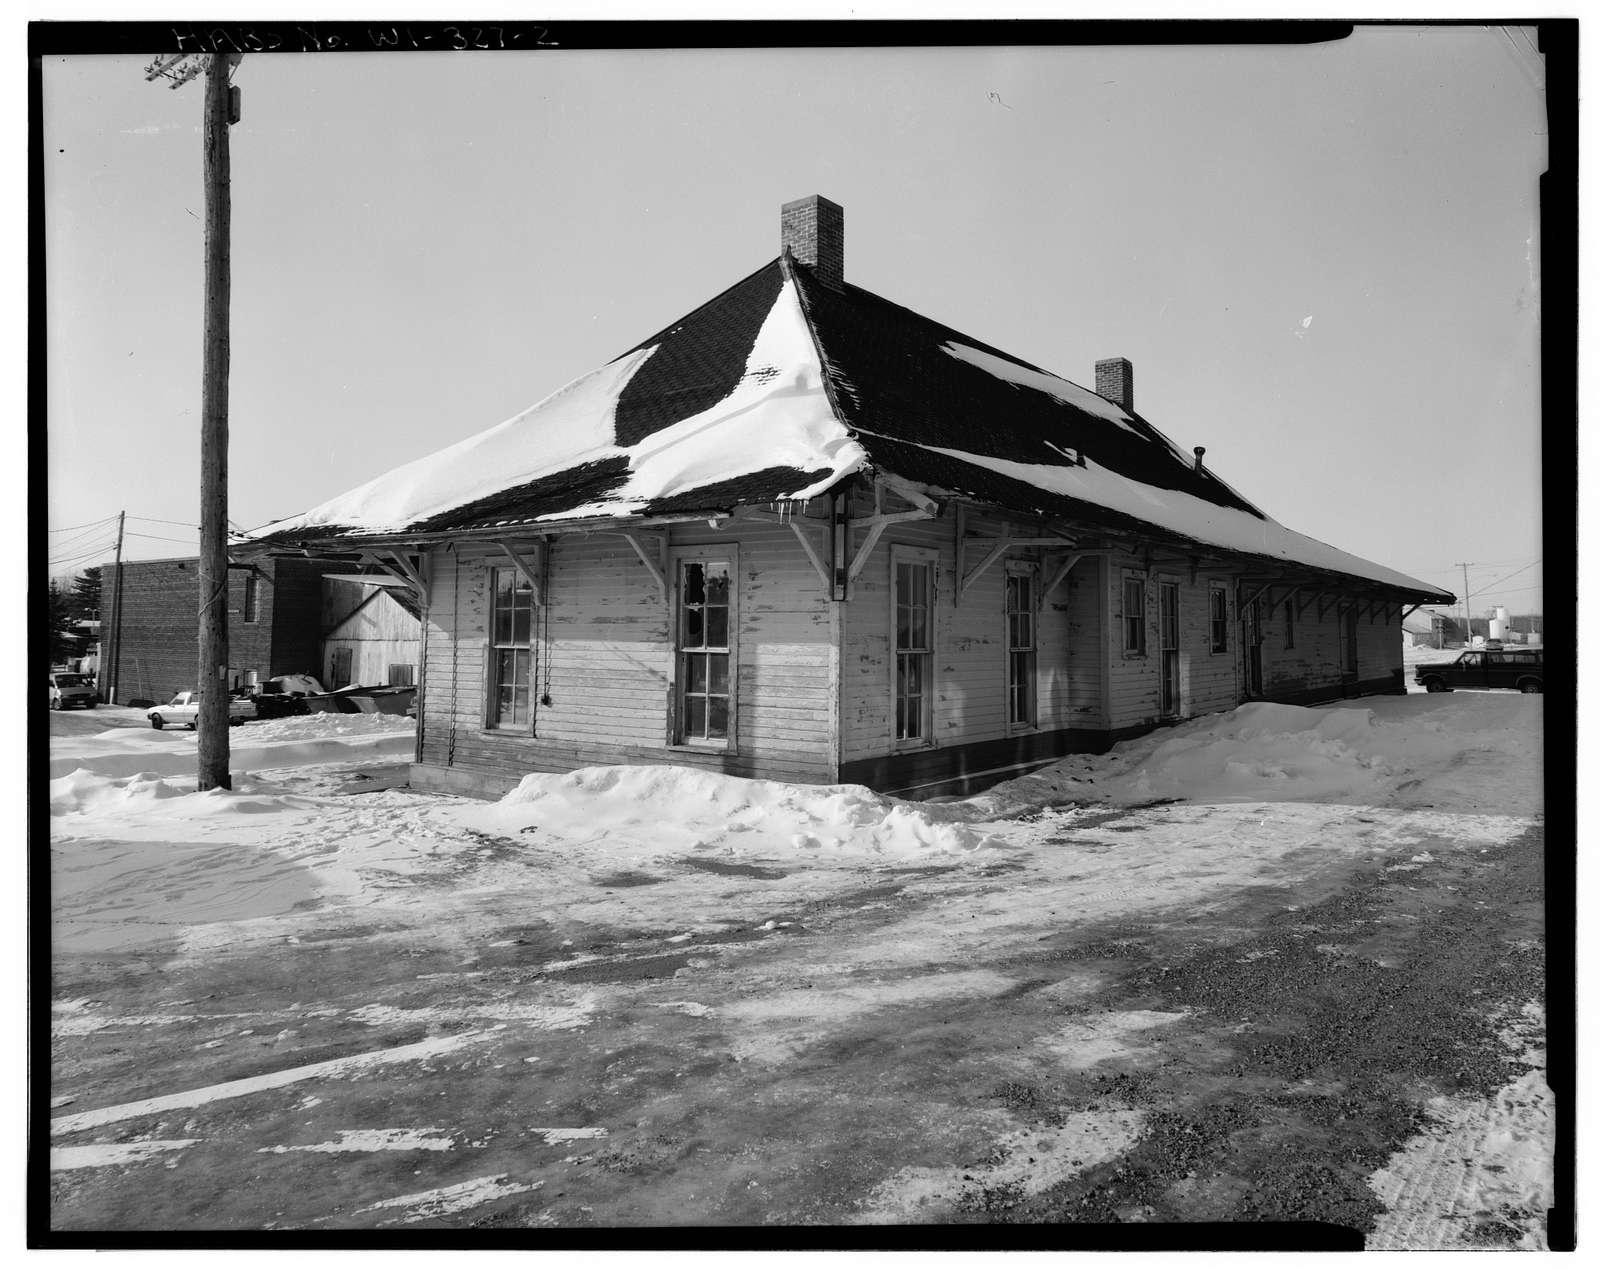 Medford Soo Line Depot, 109 West State Street, Medford, Taylor County, WI